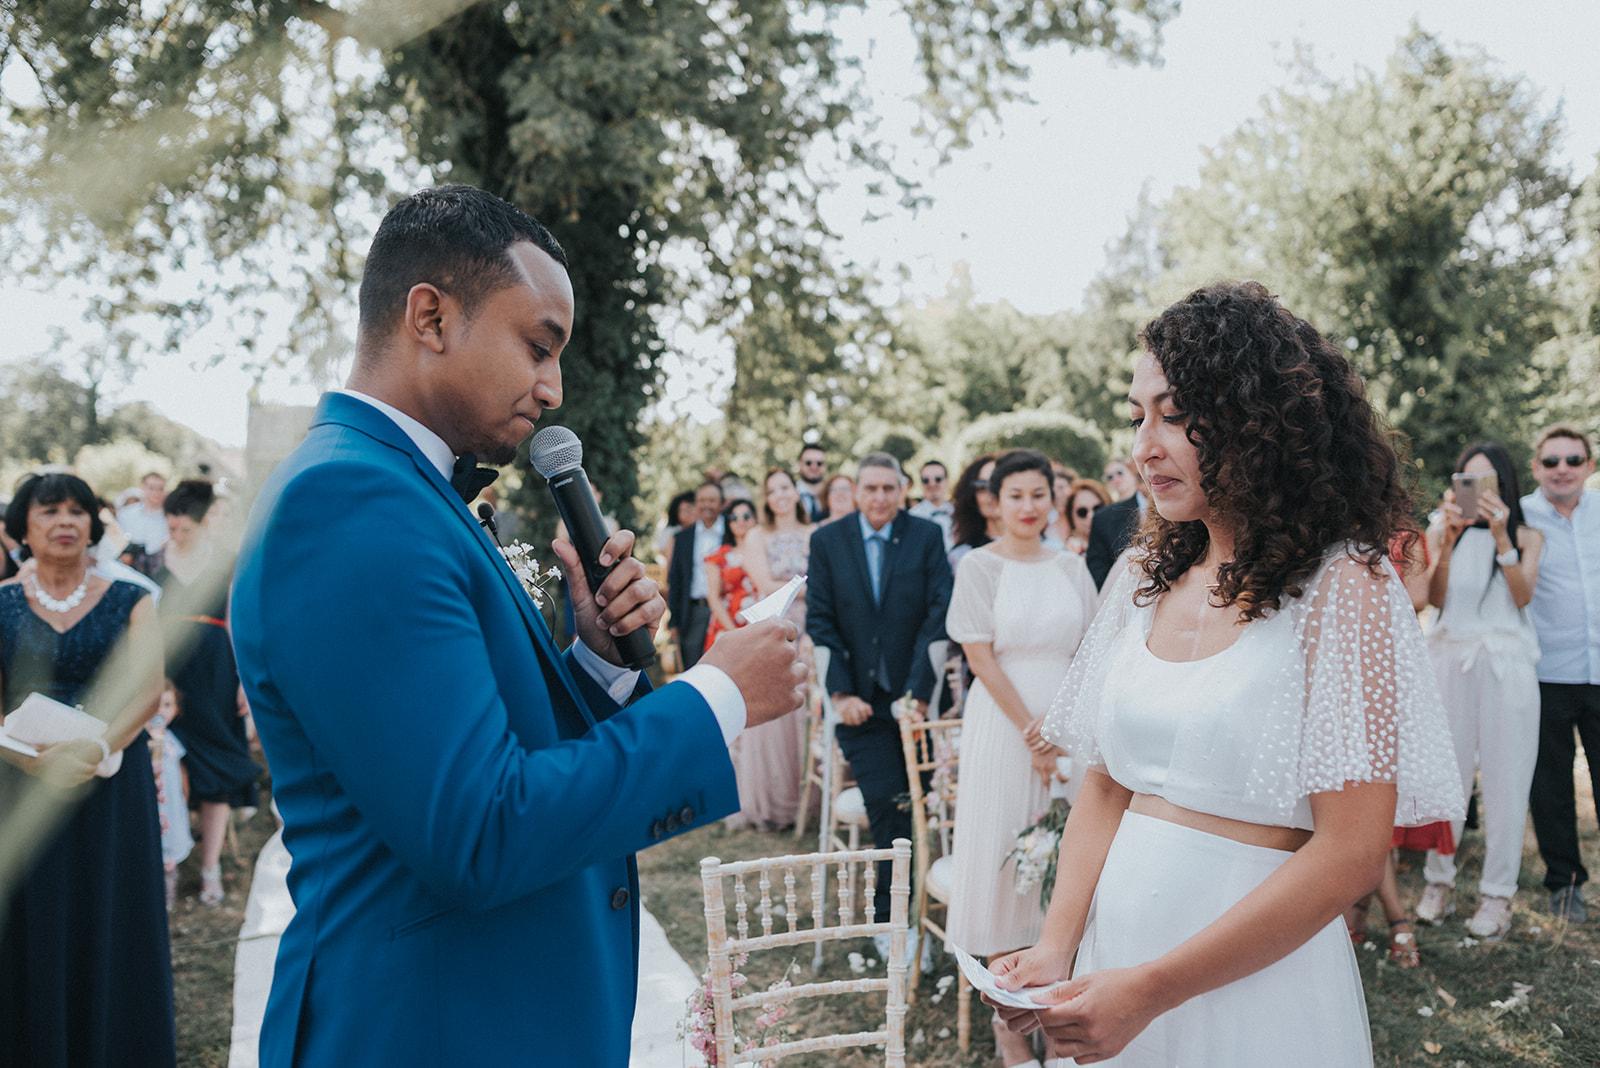 Mariage de Teddy et Arielle-281.jpg